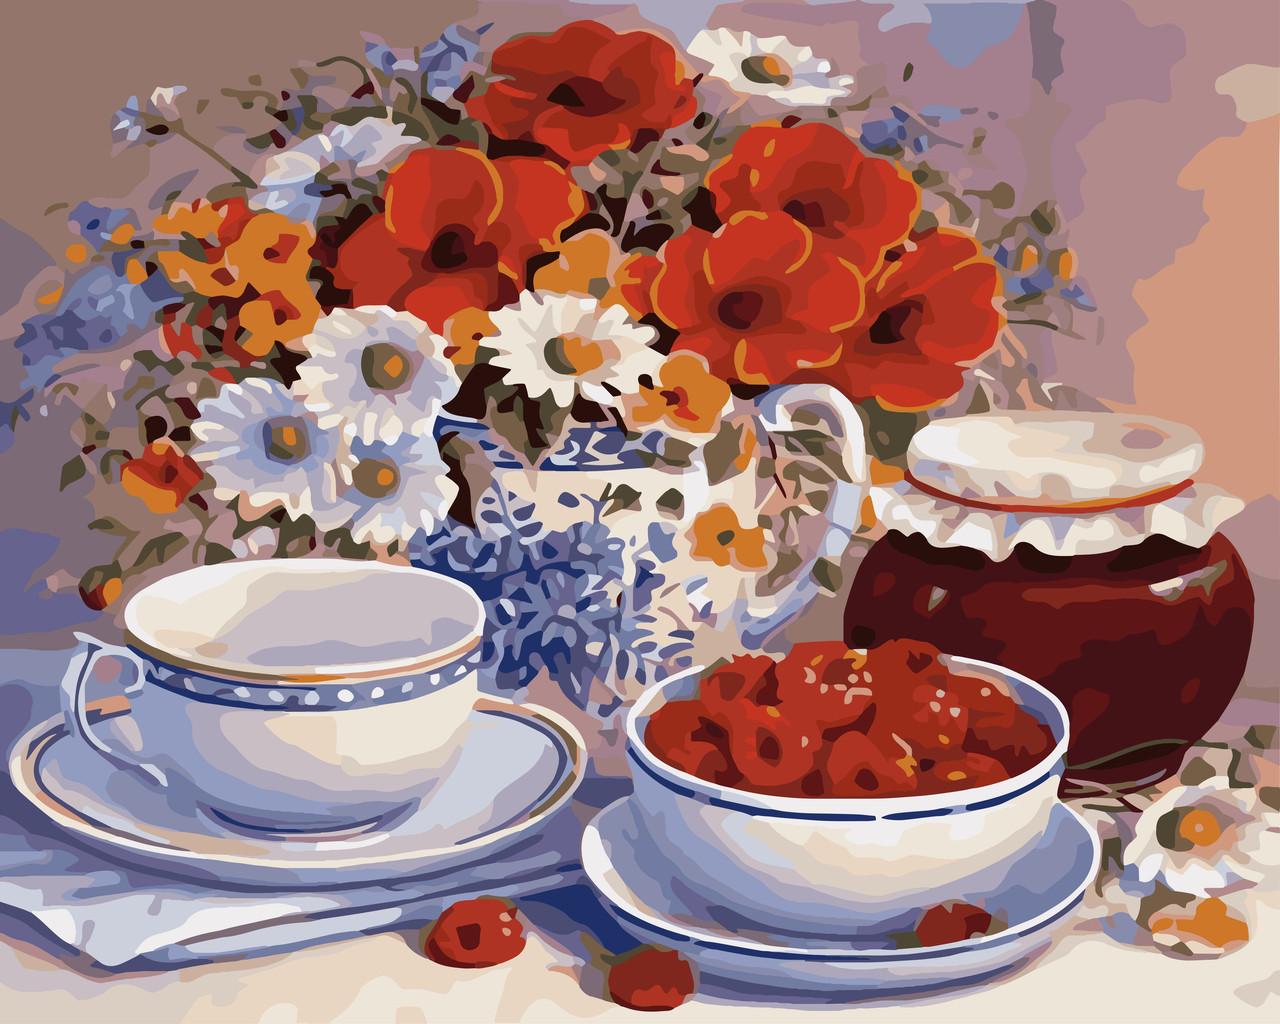 Картина по номерам КНО2029 Запрошення на чай, 40x50 см., Идейка